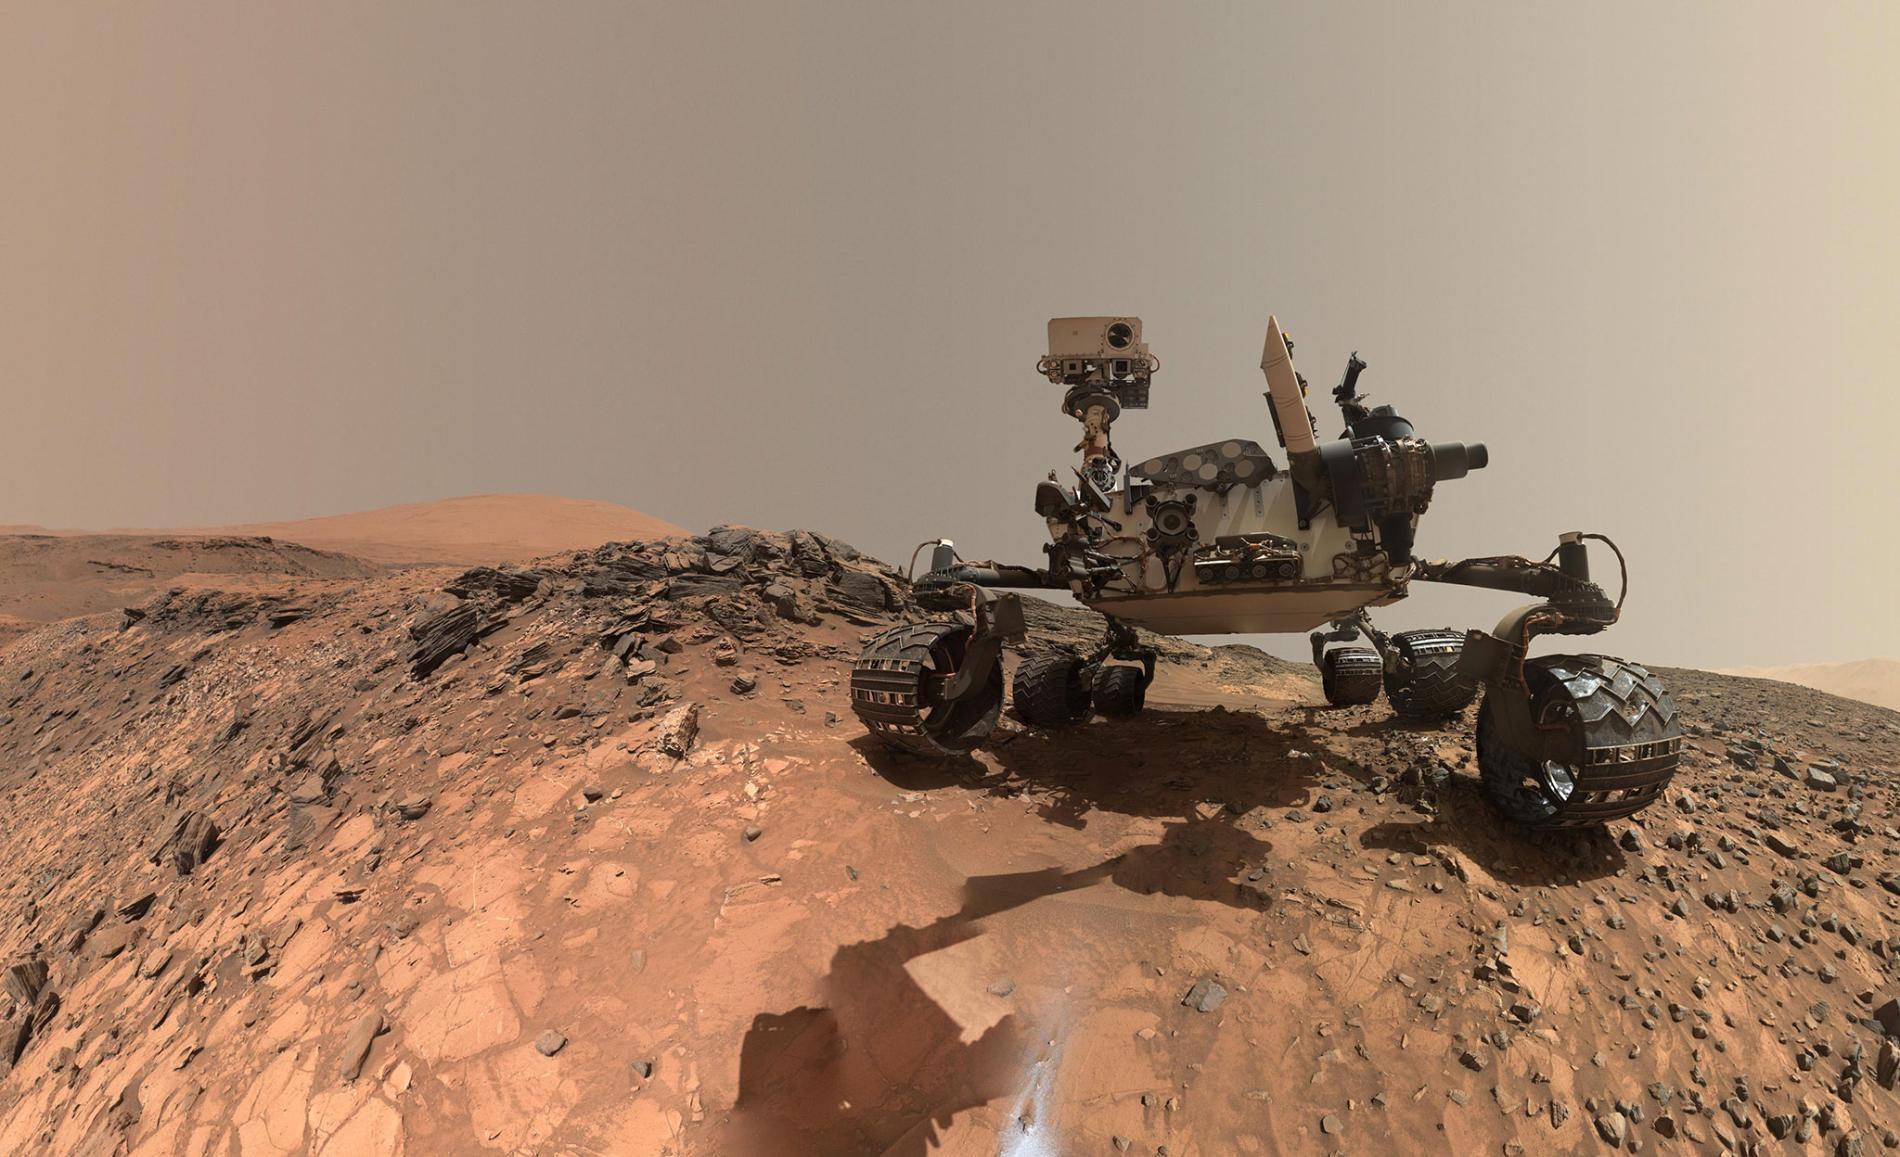 NASA的好奇號於2015年暫時停留在夏普山的較低區域,拍攝自拍照。自2012年以來,它就一直在探索火星的這個區域,收集大氣資料等科學數據。PHOTOGRAPH COURTESY NASA, JPL-CALTECH/MSSS